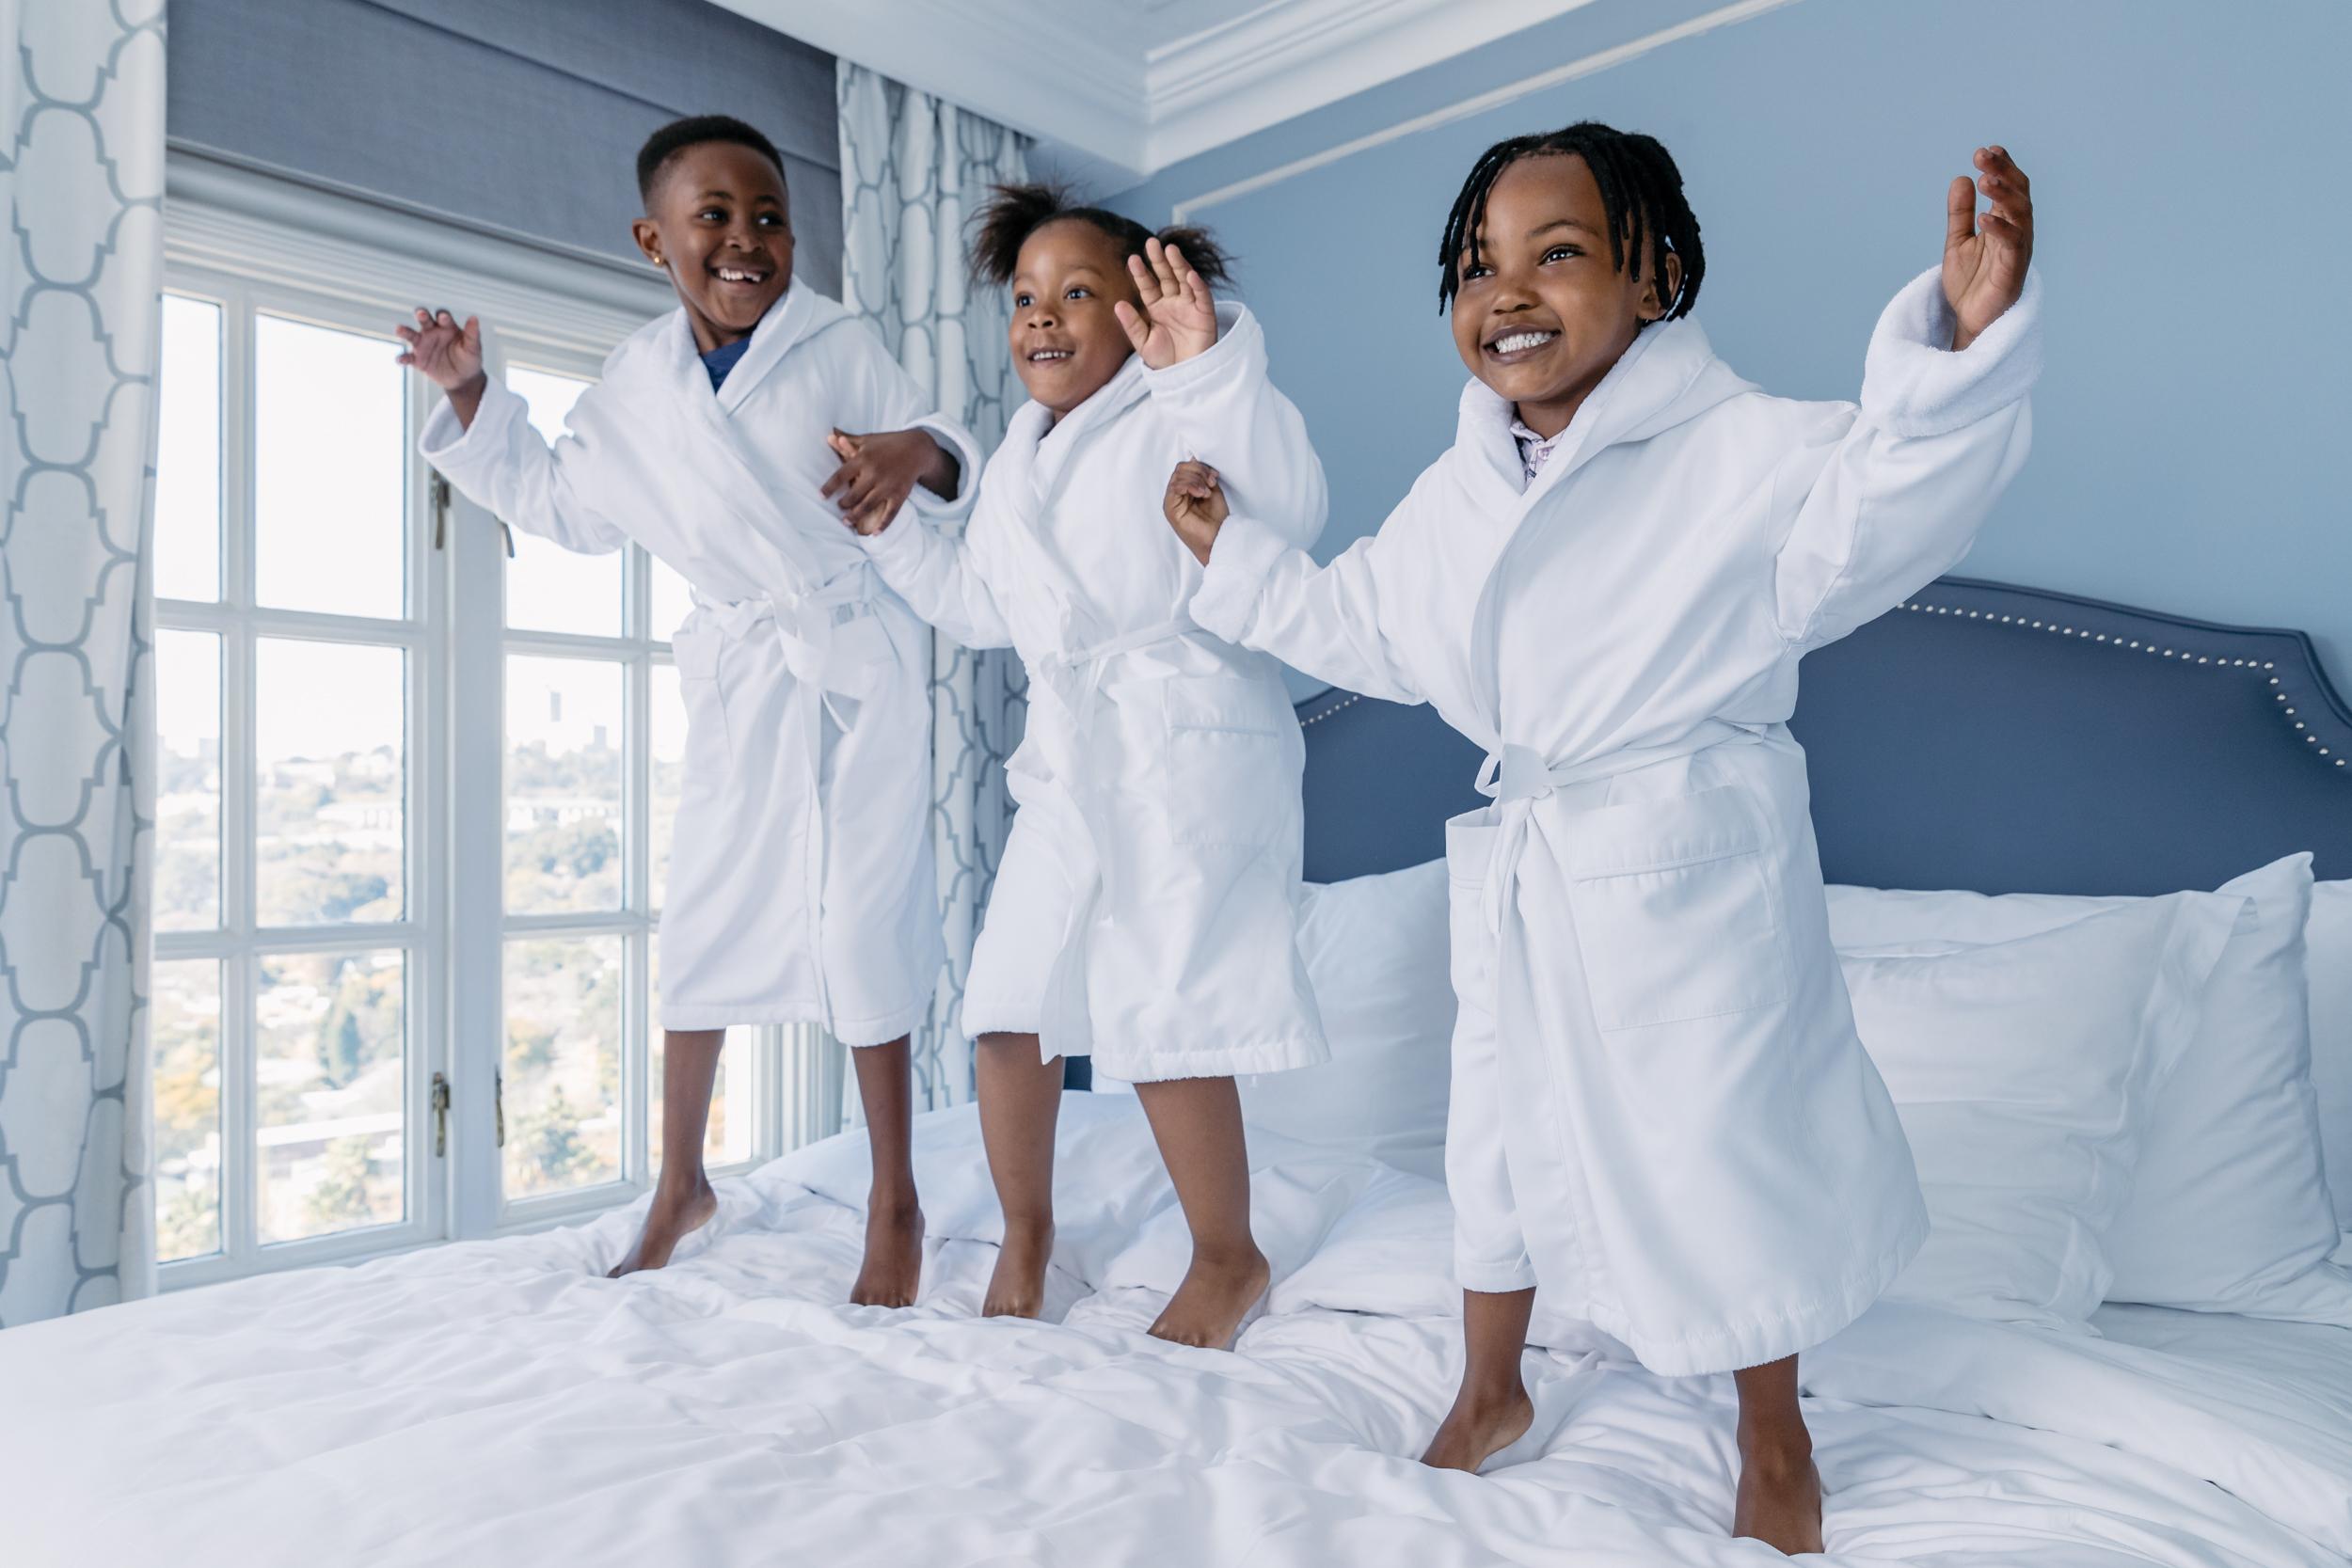 FS JHB - Kids Jumping Bed - 2500px.jpg